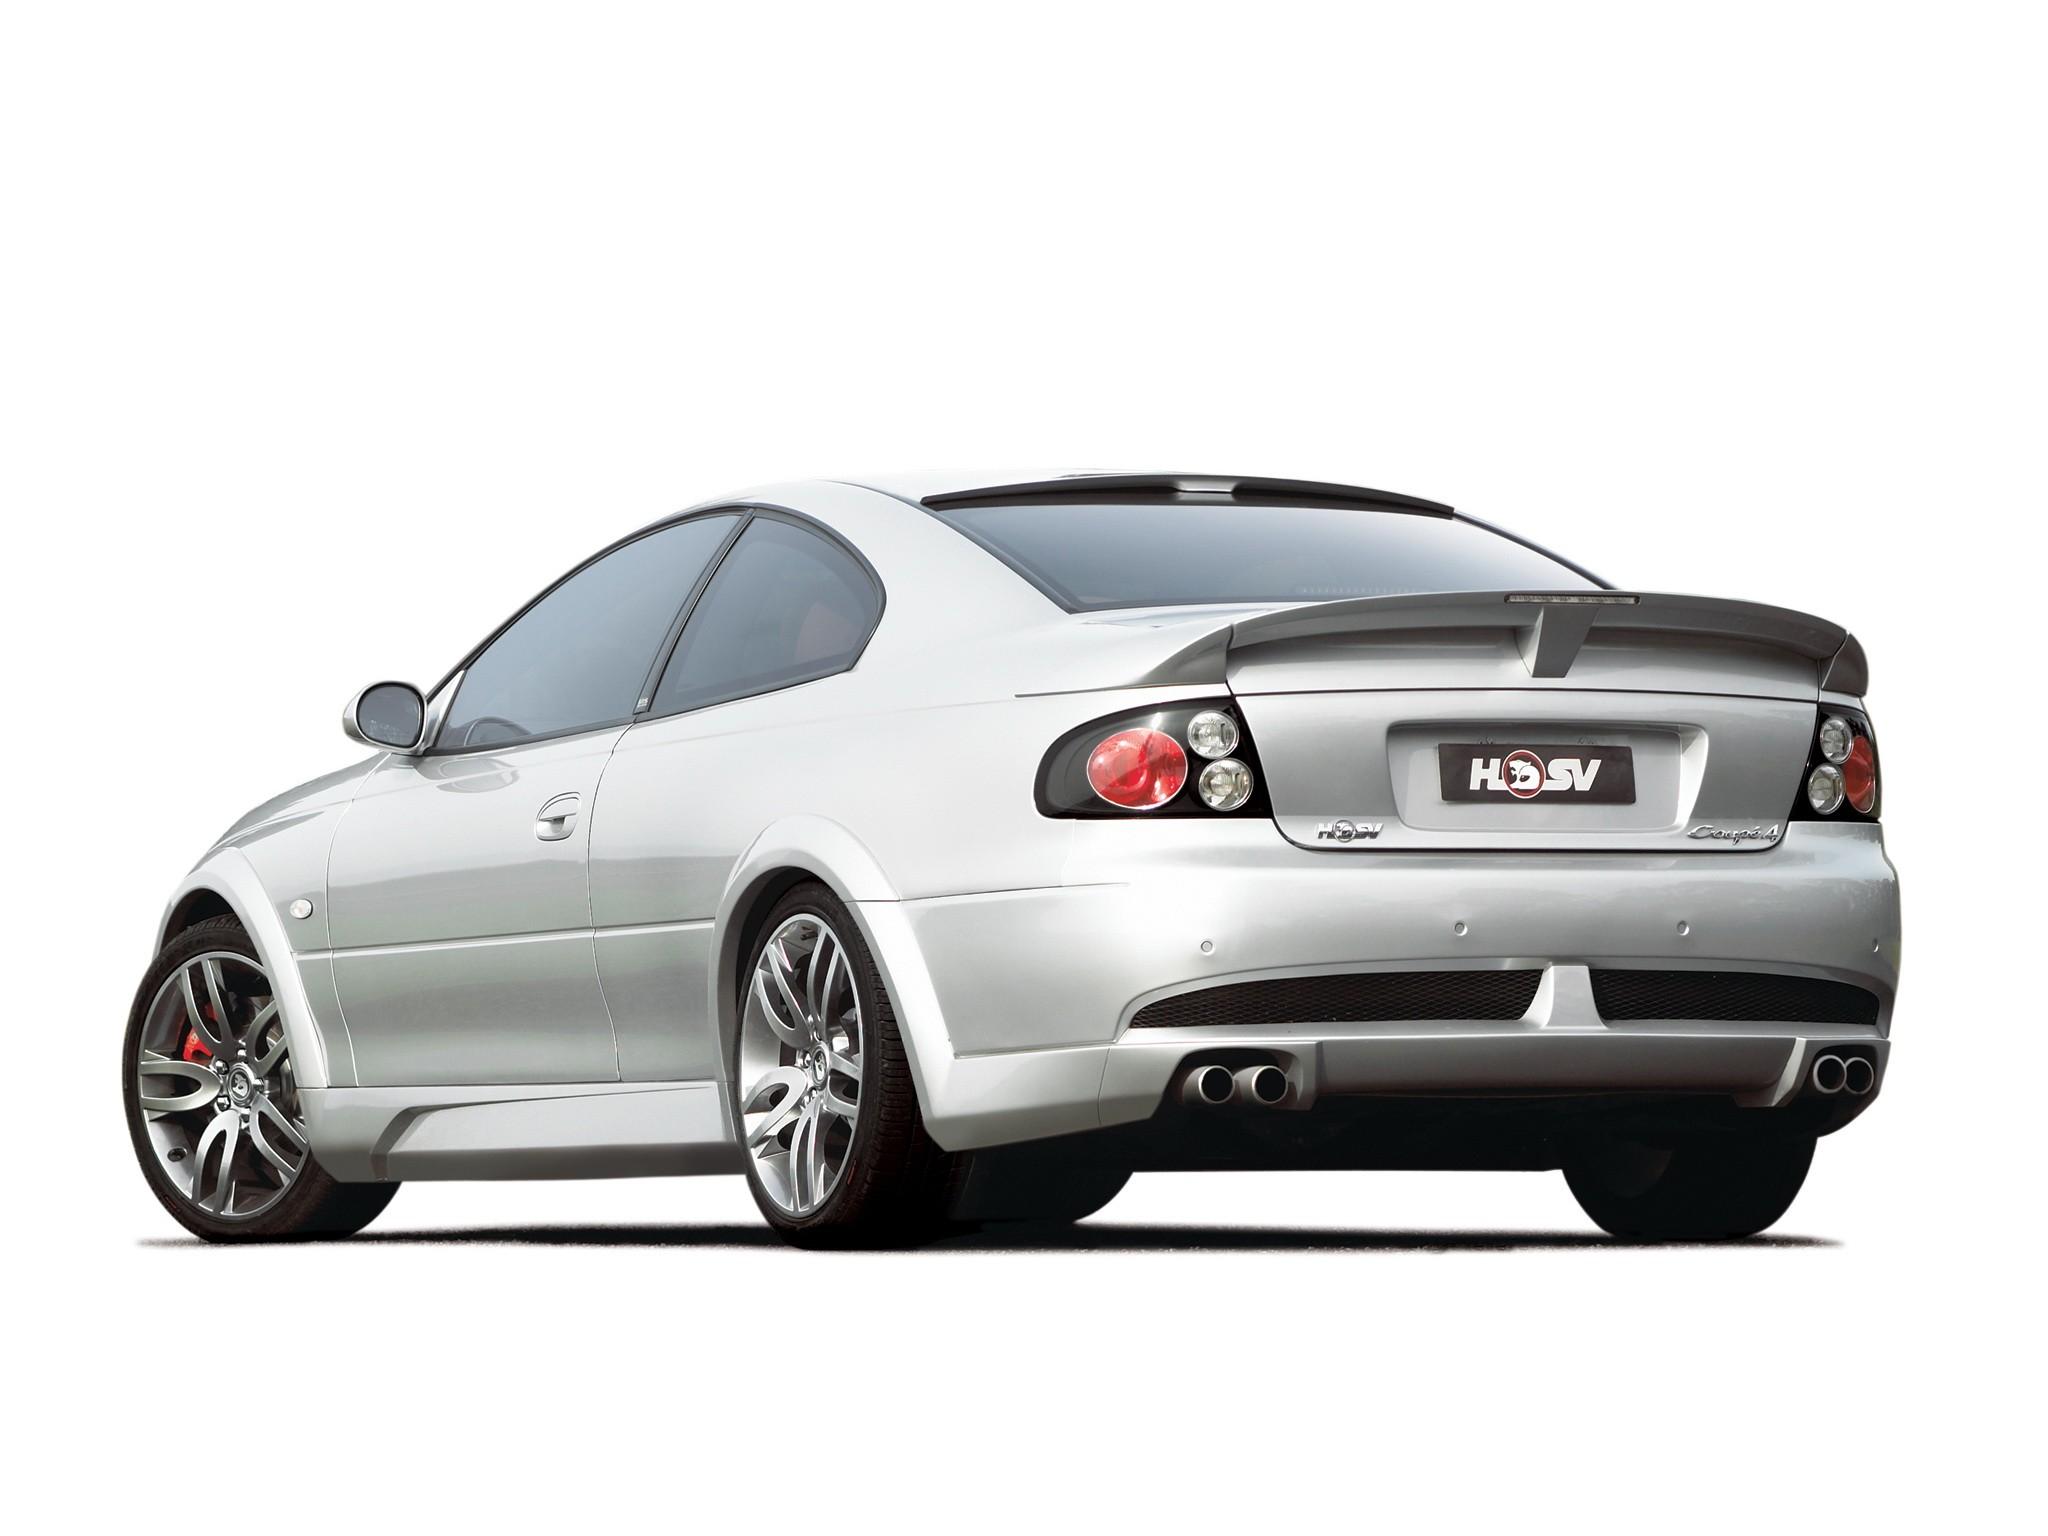 2004 HSV Coupe 4